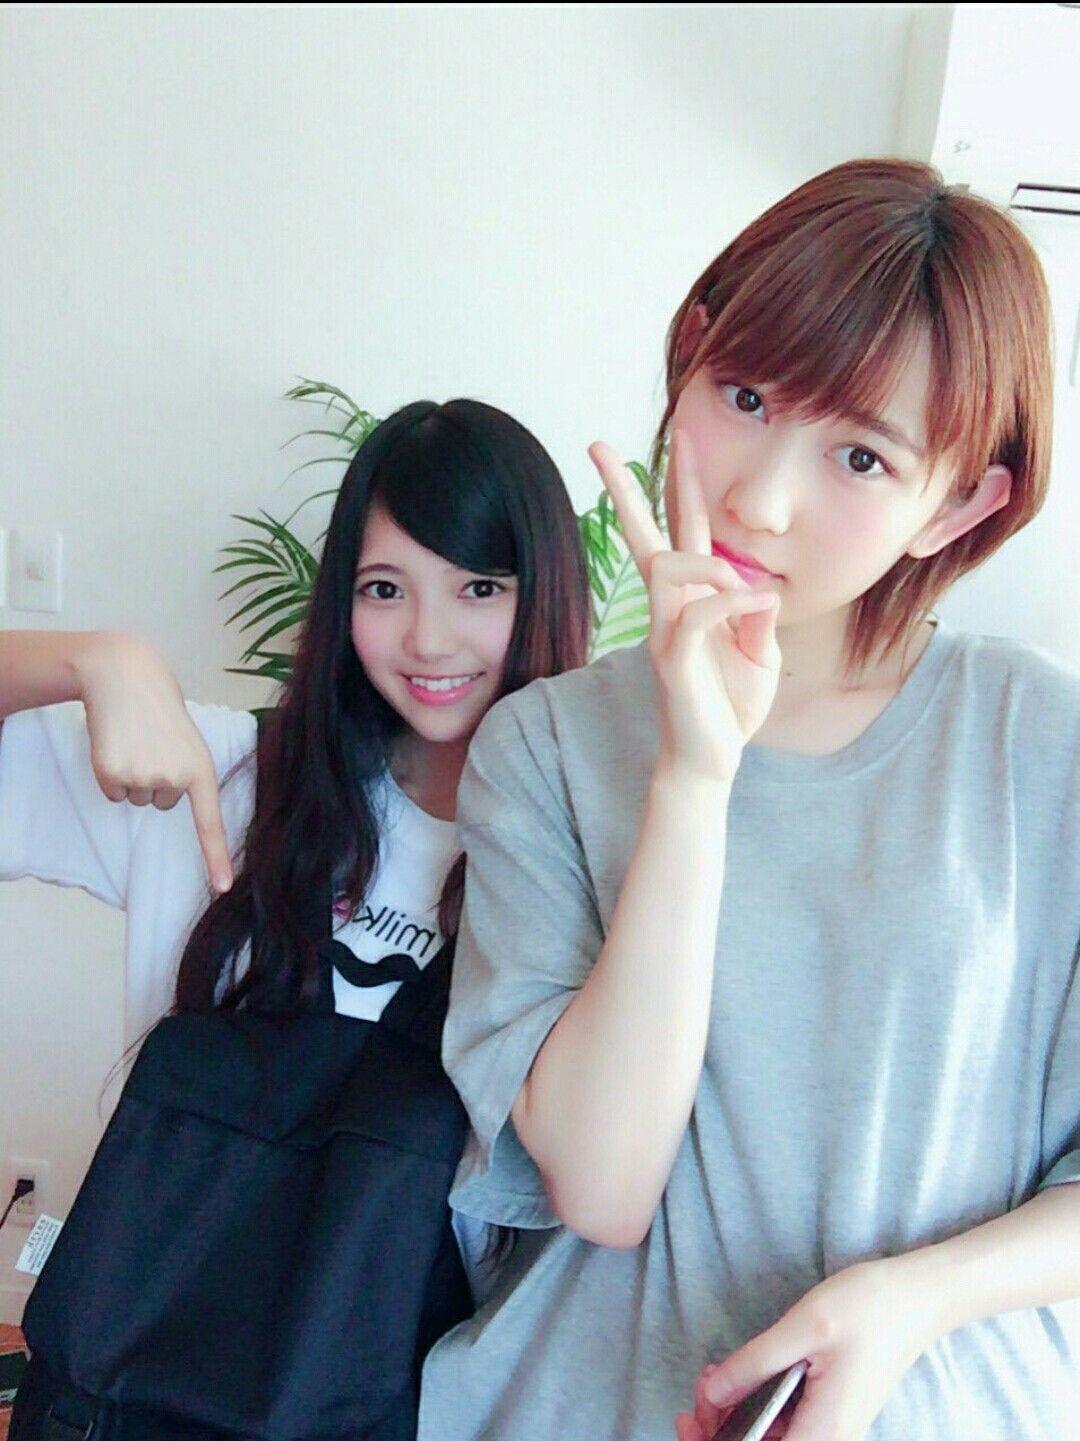 欅坂46 上村莉菜 志田愛佳 Keyakizaka46 Uemura Rina Shida Manaka